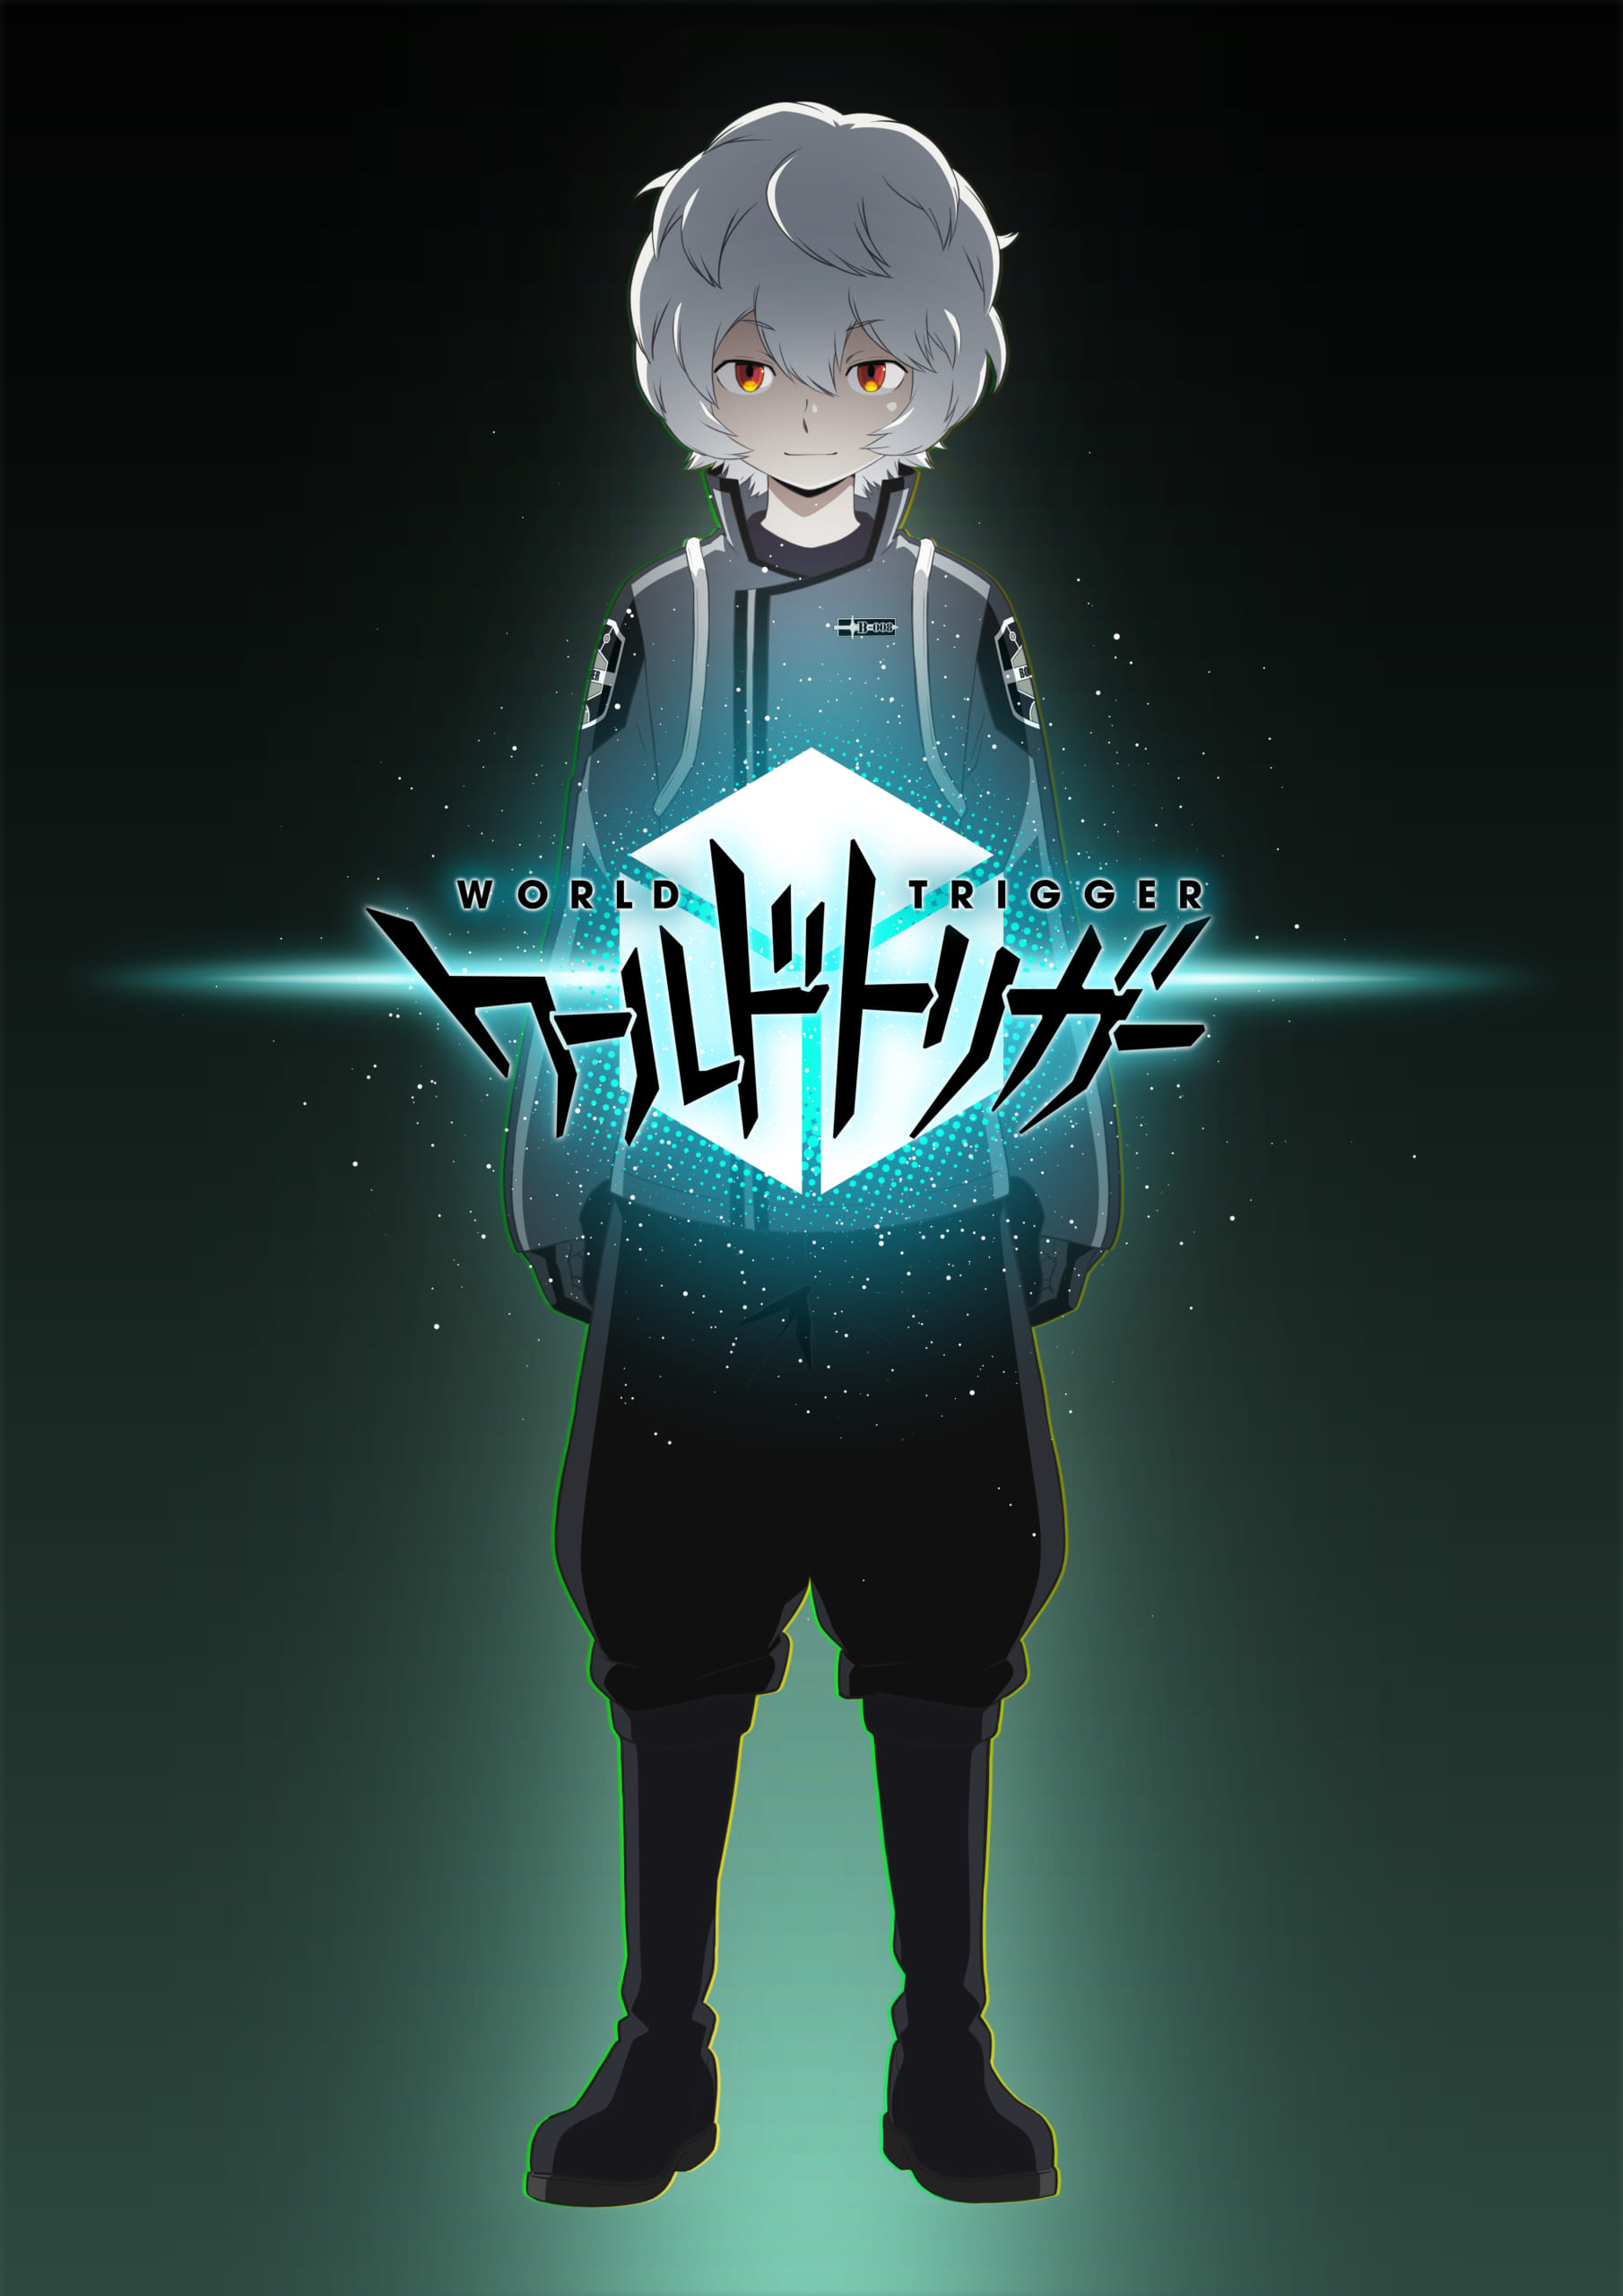 TVアニメ『ワールドトリガー』2ndシーズンのティザービジュアル公開!最新情報が発表される生配信特番も決定